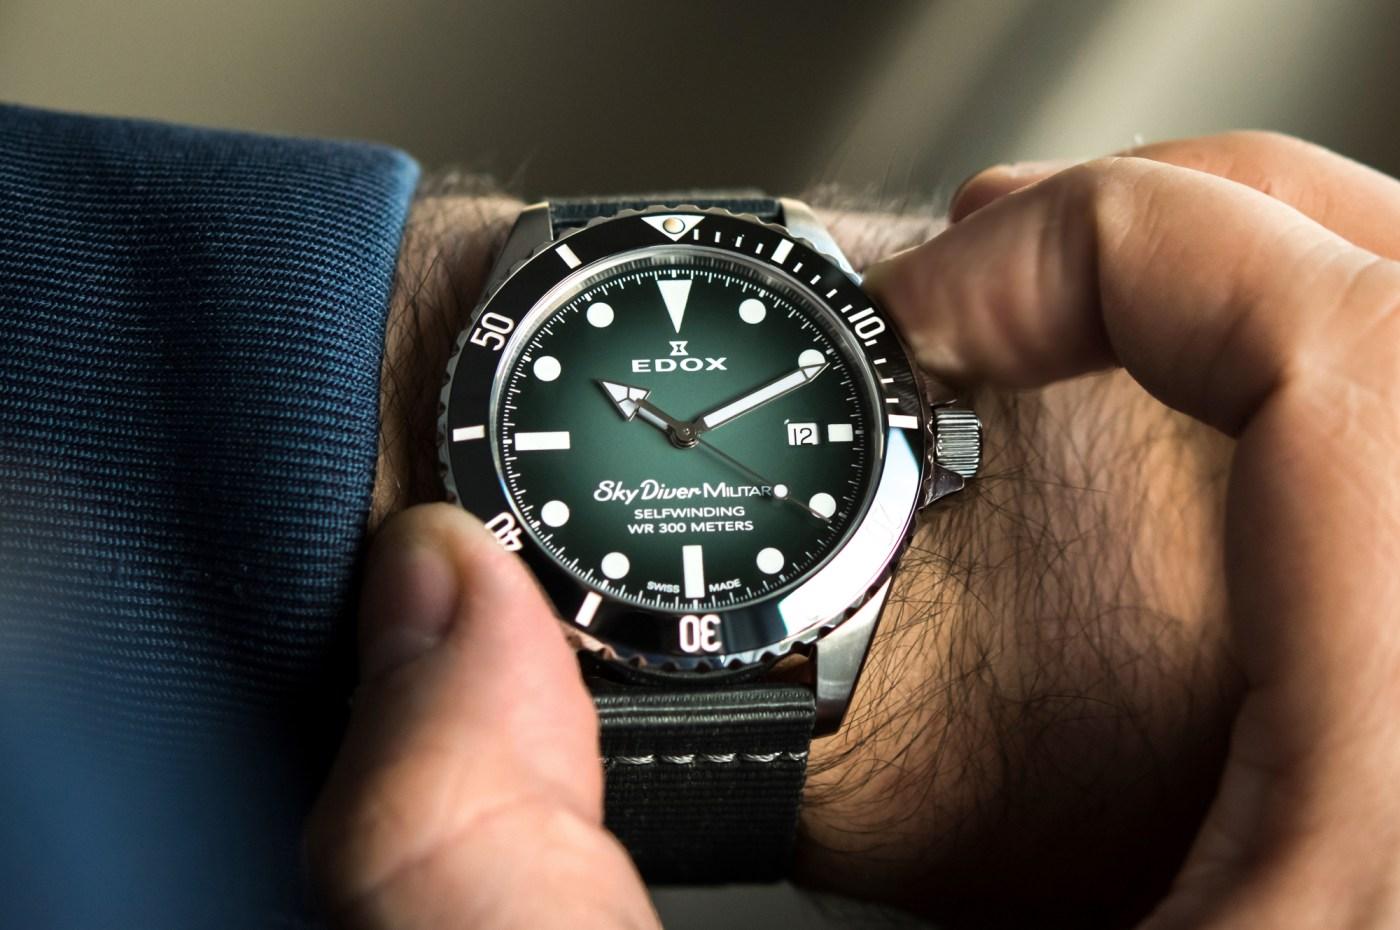 Skydiver Military Limited Edition wristshot